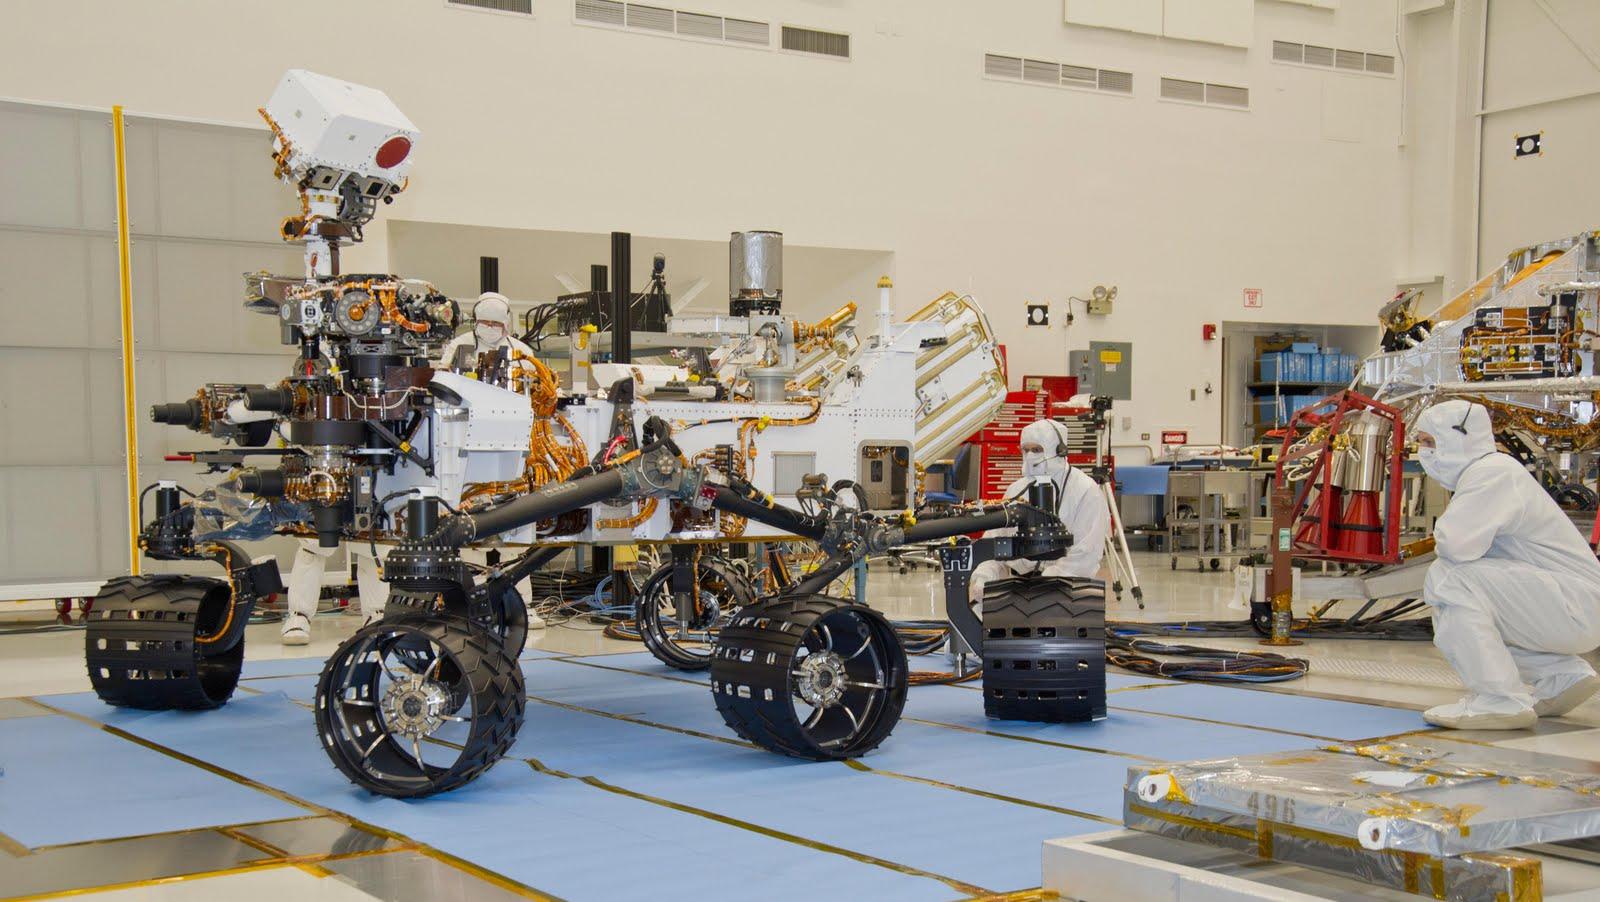 mars rover ultimo mensaje - photo #36